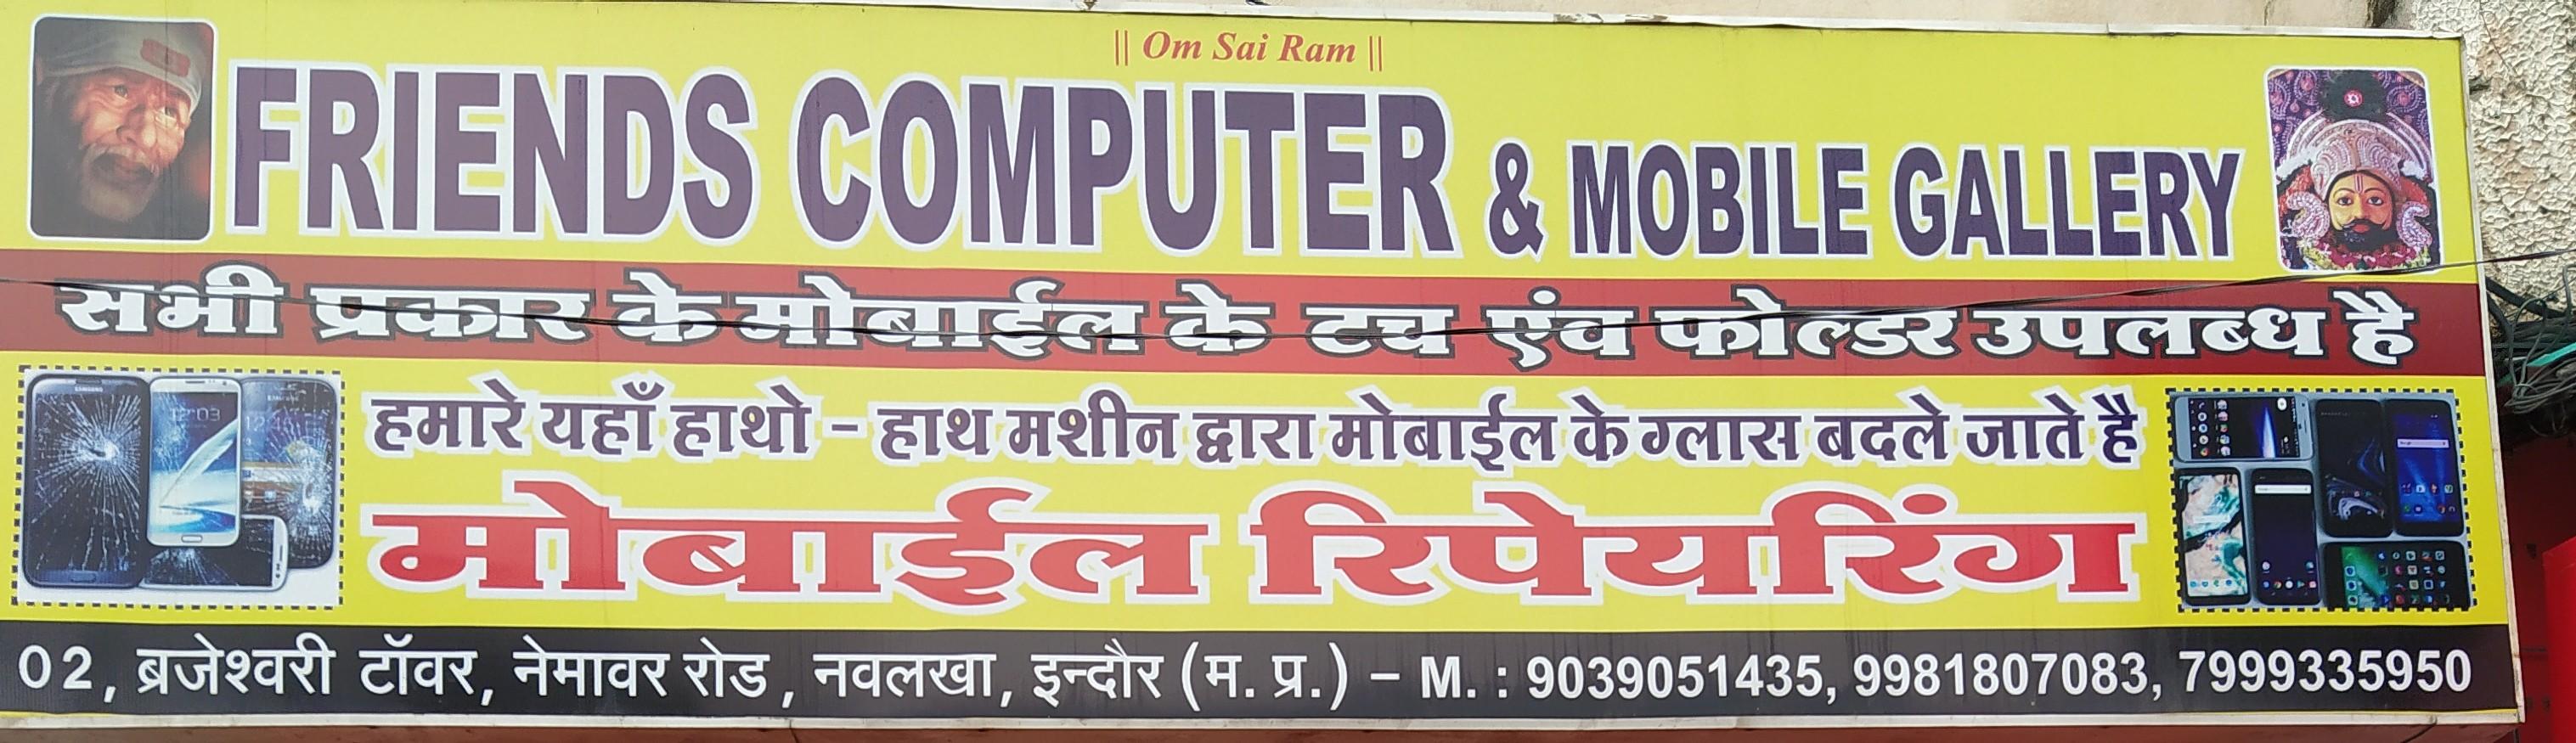 Friends computer